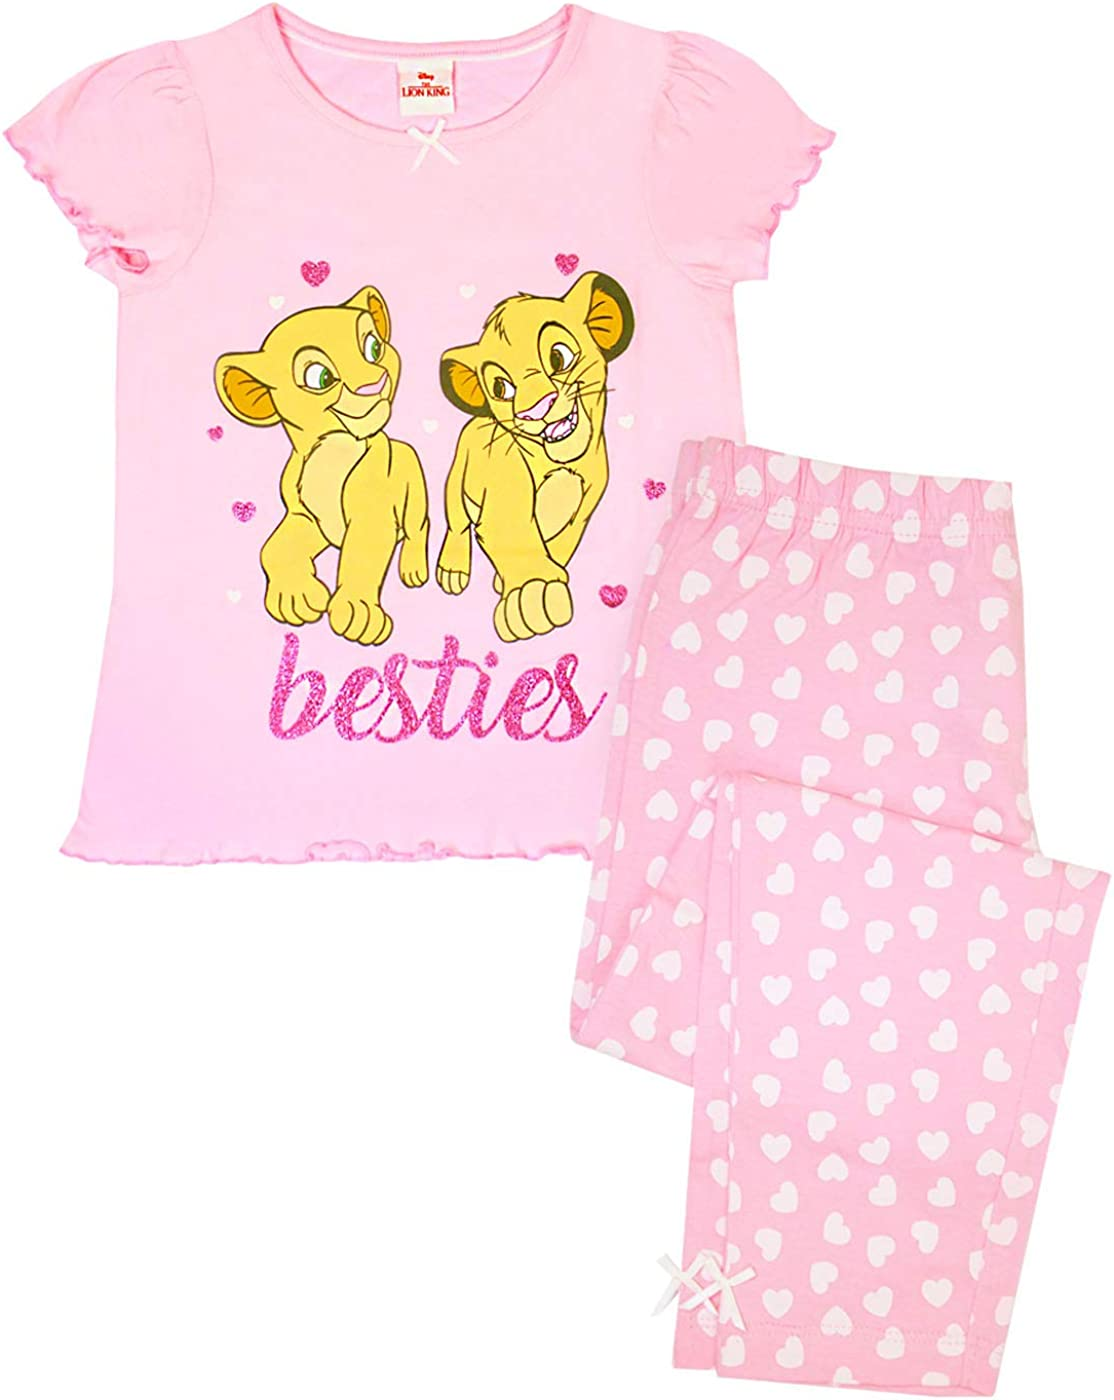 Disney Girls Lion King Pyjamas Multicoloured Age 5 to 6 Years